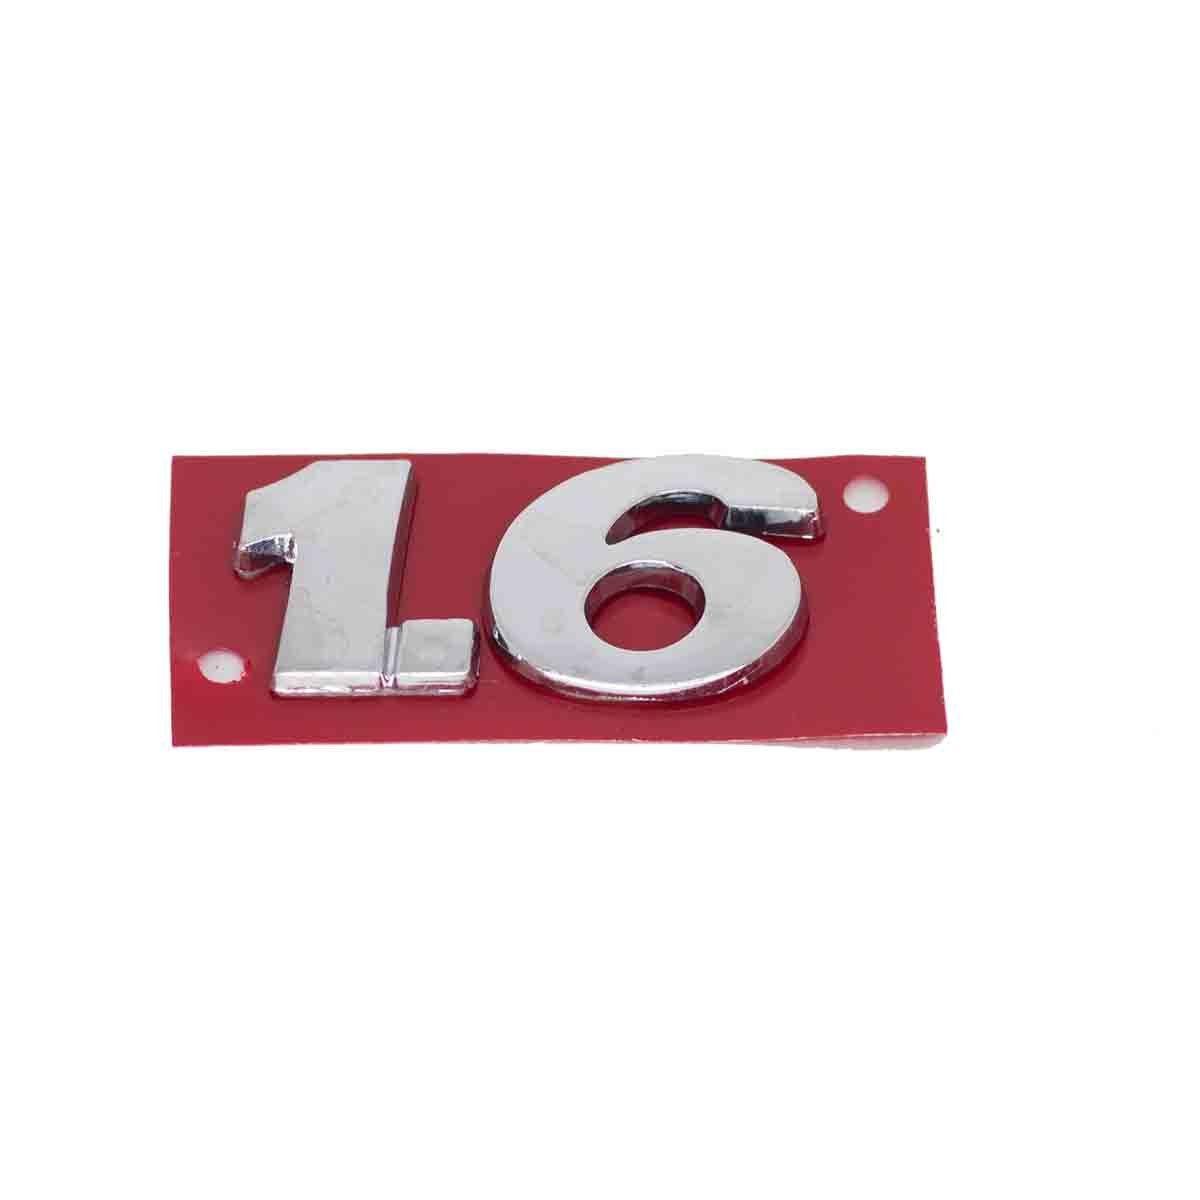 Emblema 1.6 G5 Cromado